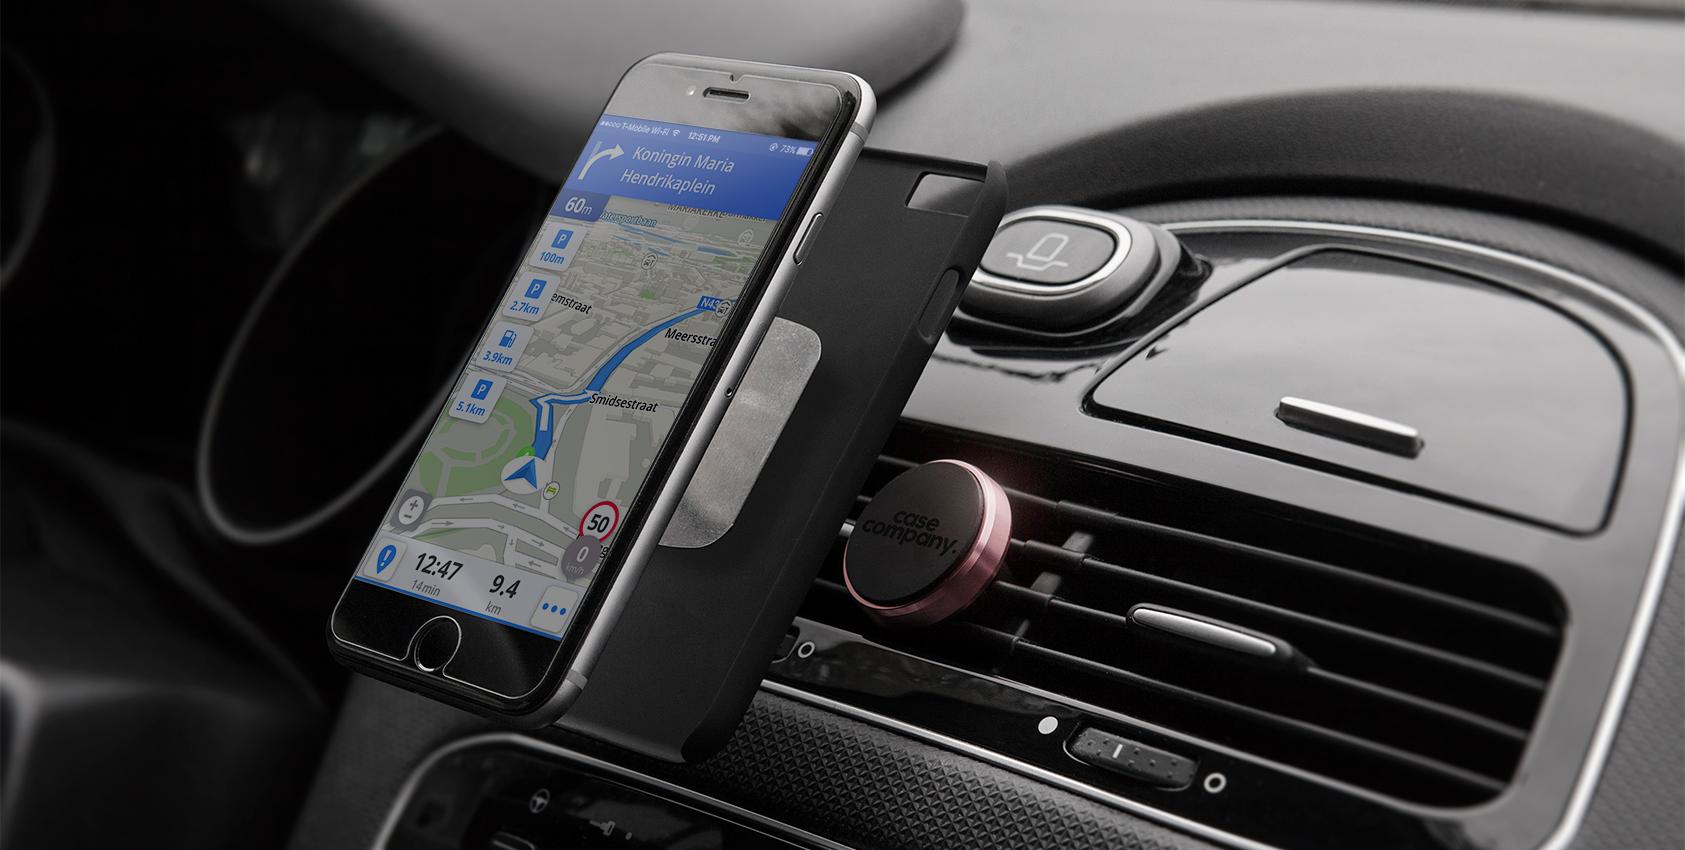 GPS voiture sur smartphone